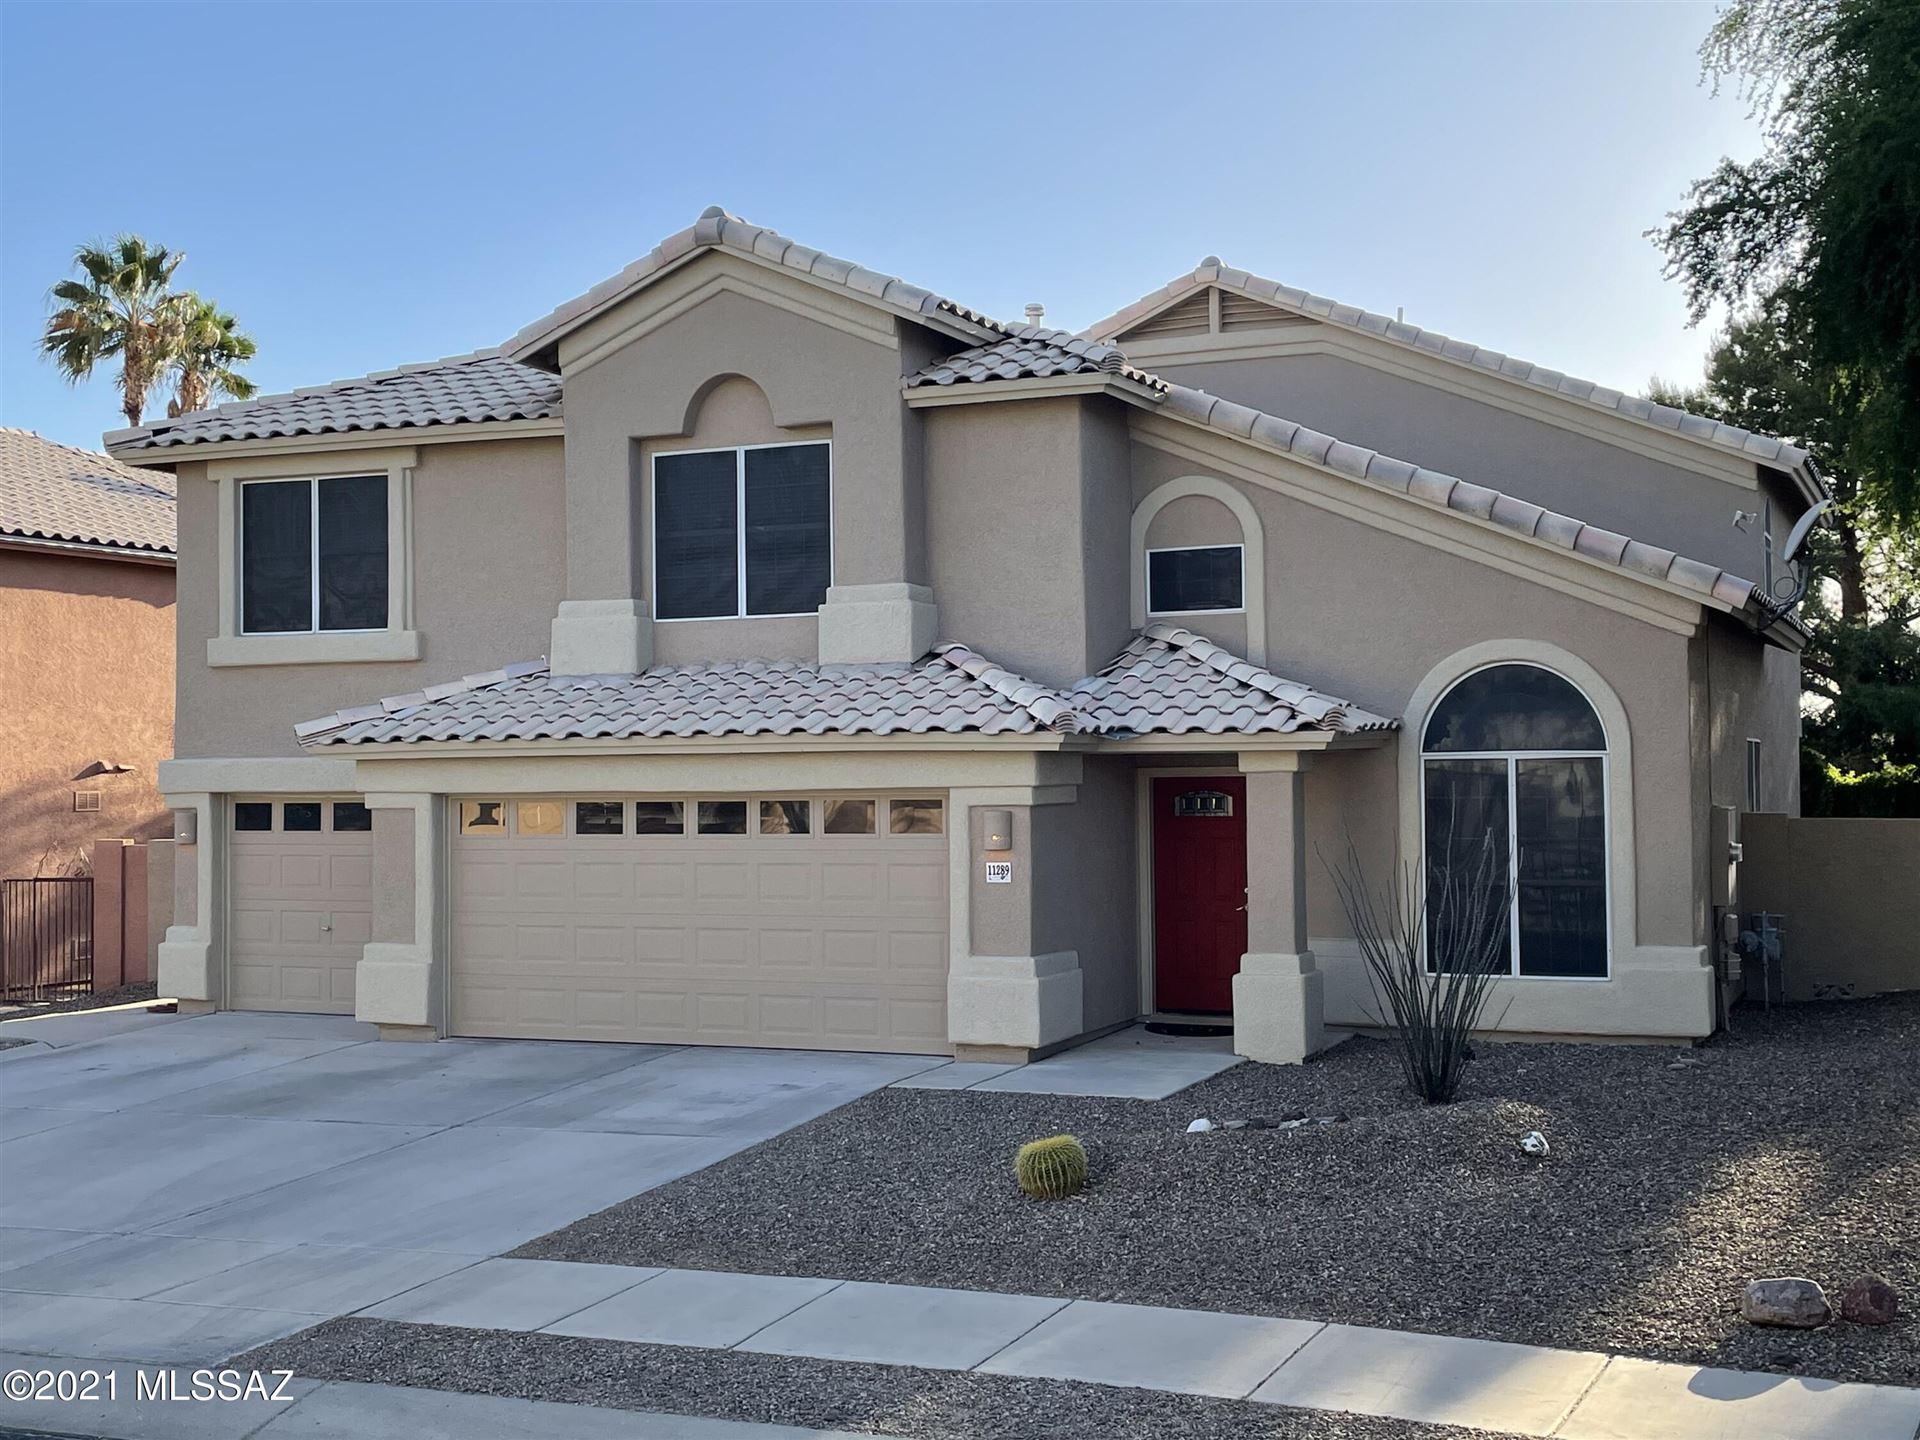 11289 N Seven Falls Drive, Tucson, AZ 85737 - MLS#: 22112185